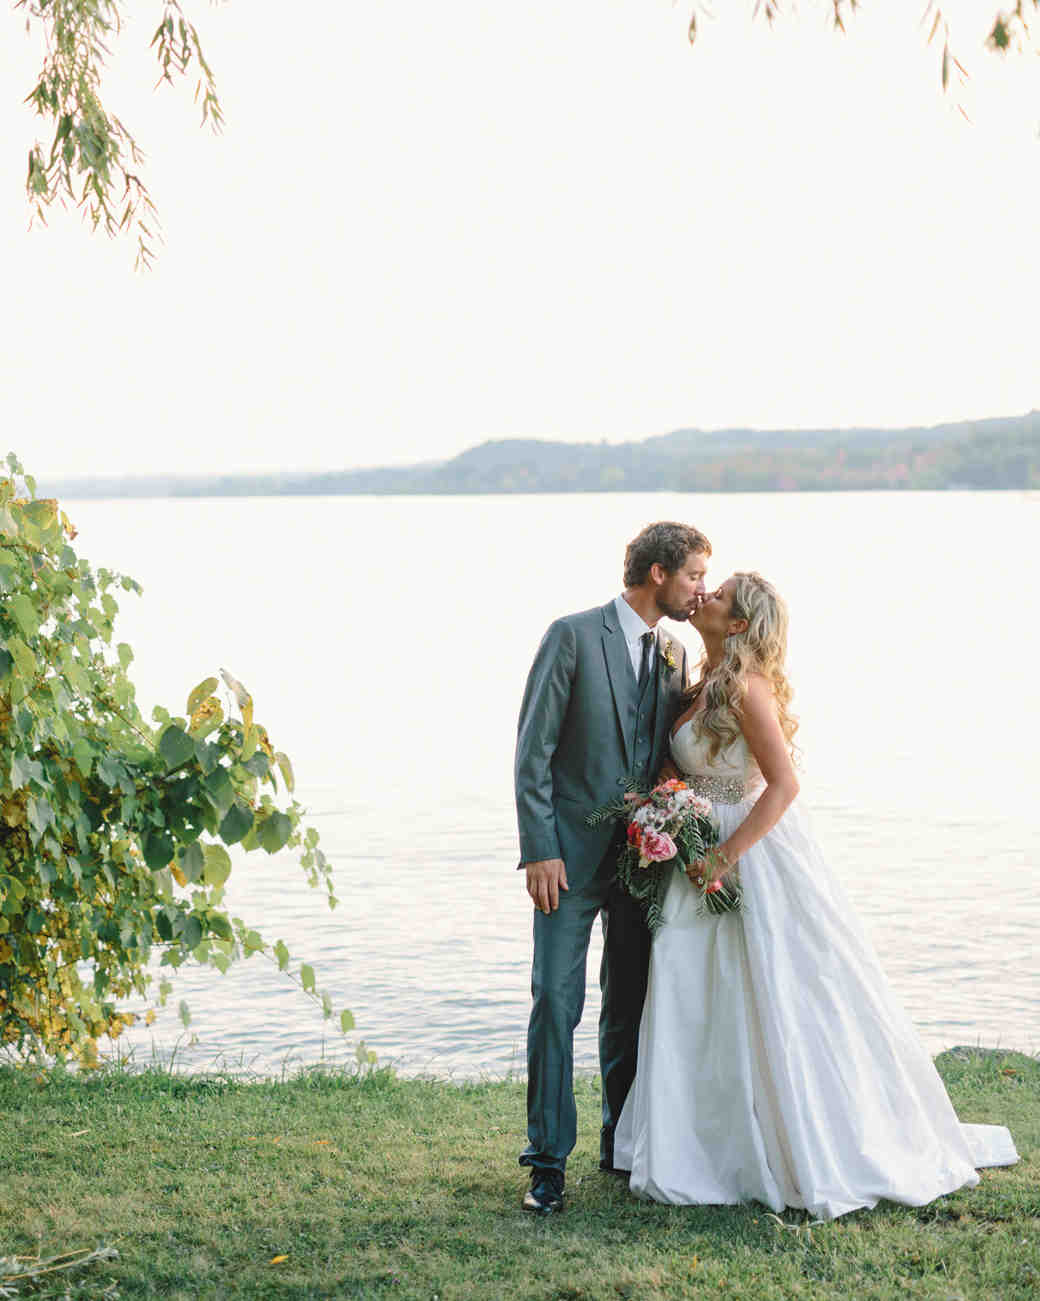 Lizzy and Bucky's Lakeside Michigan Destination Wedding